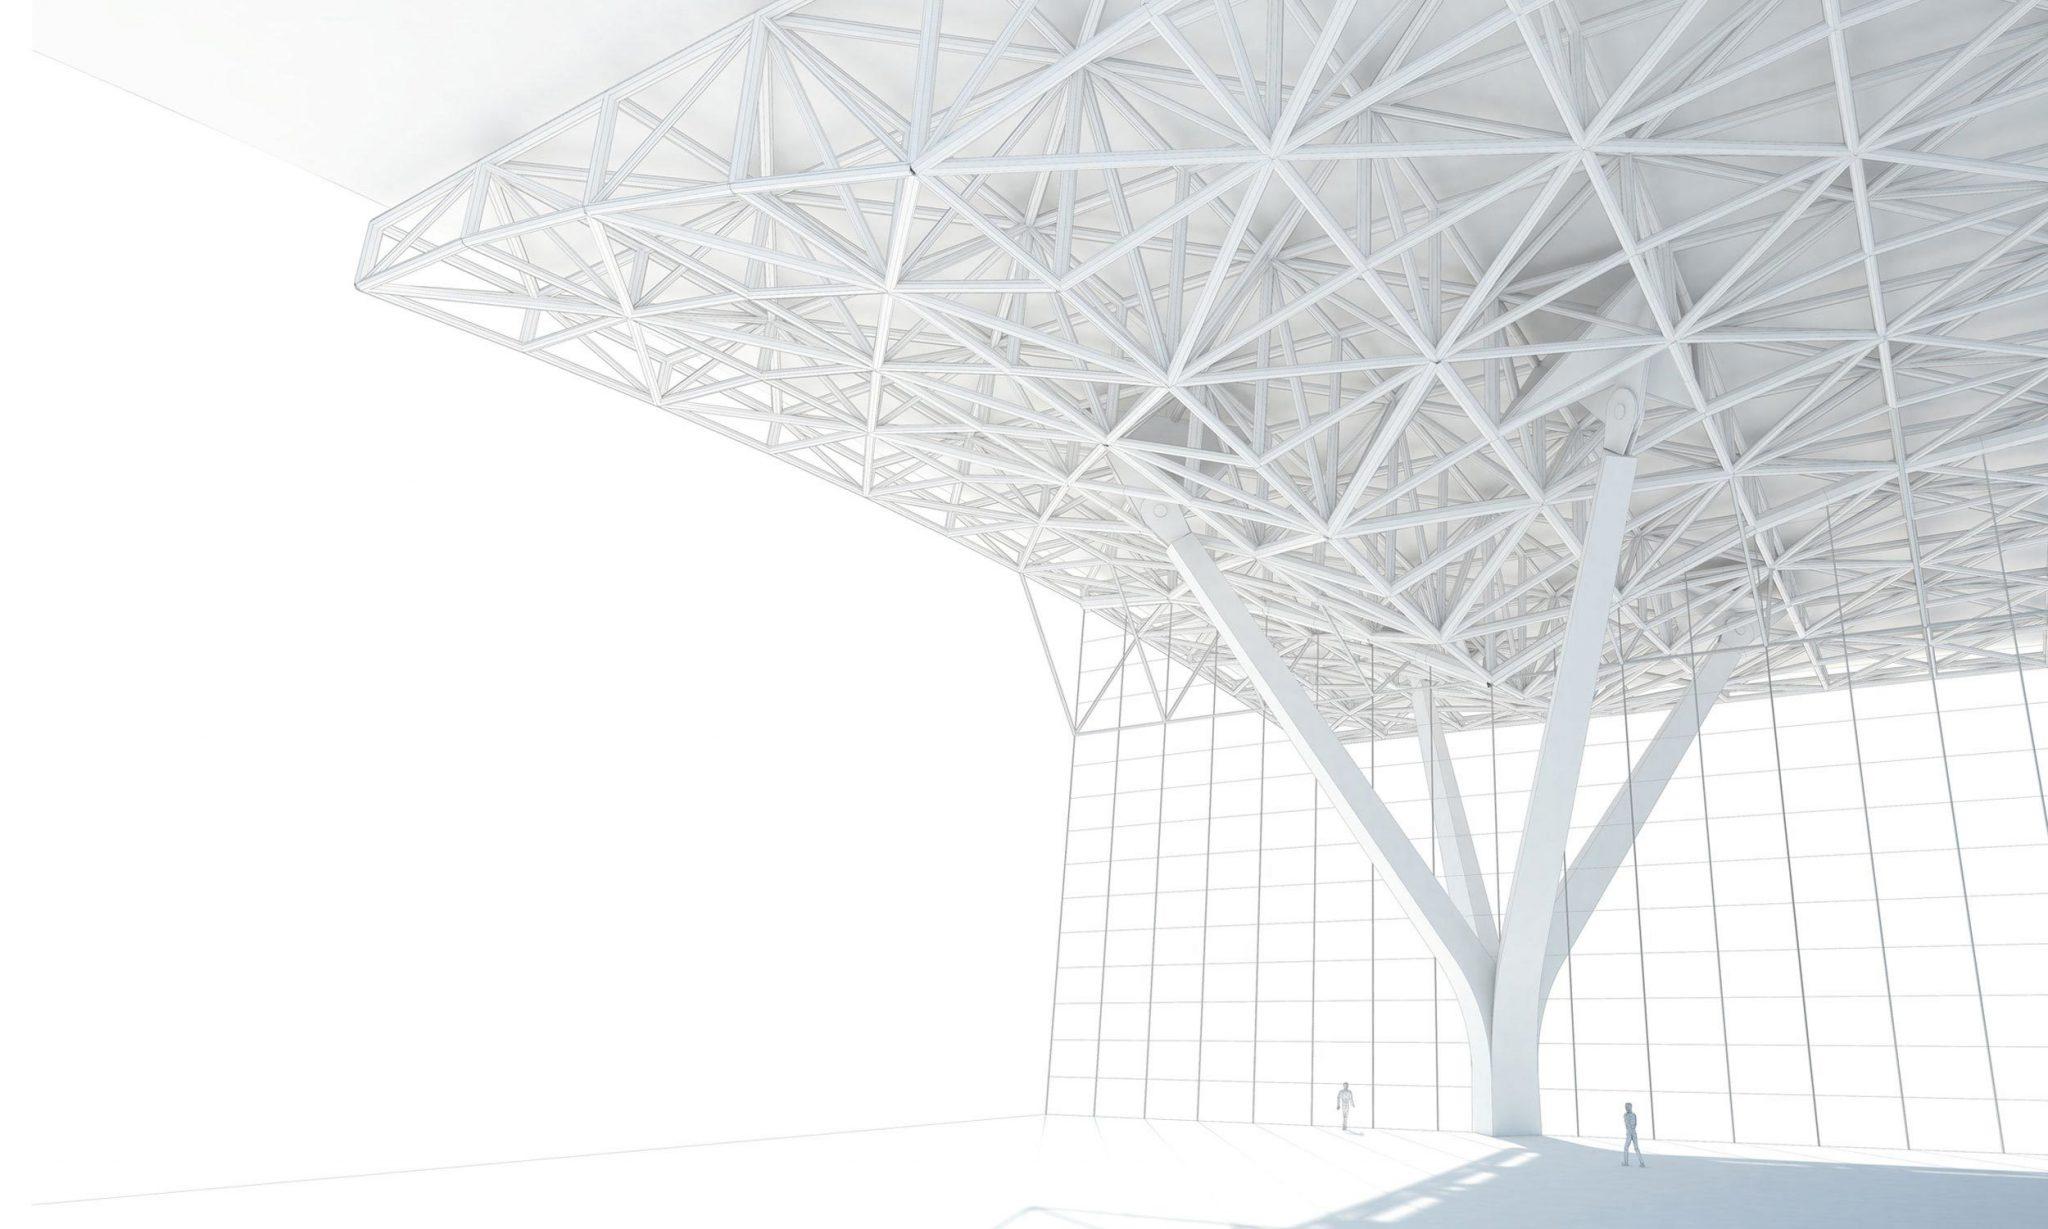 Incheon airport structural design detail